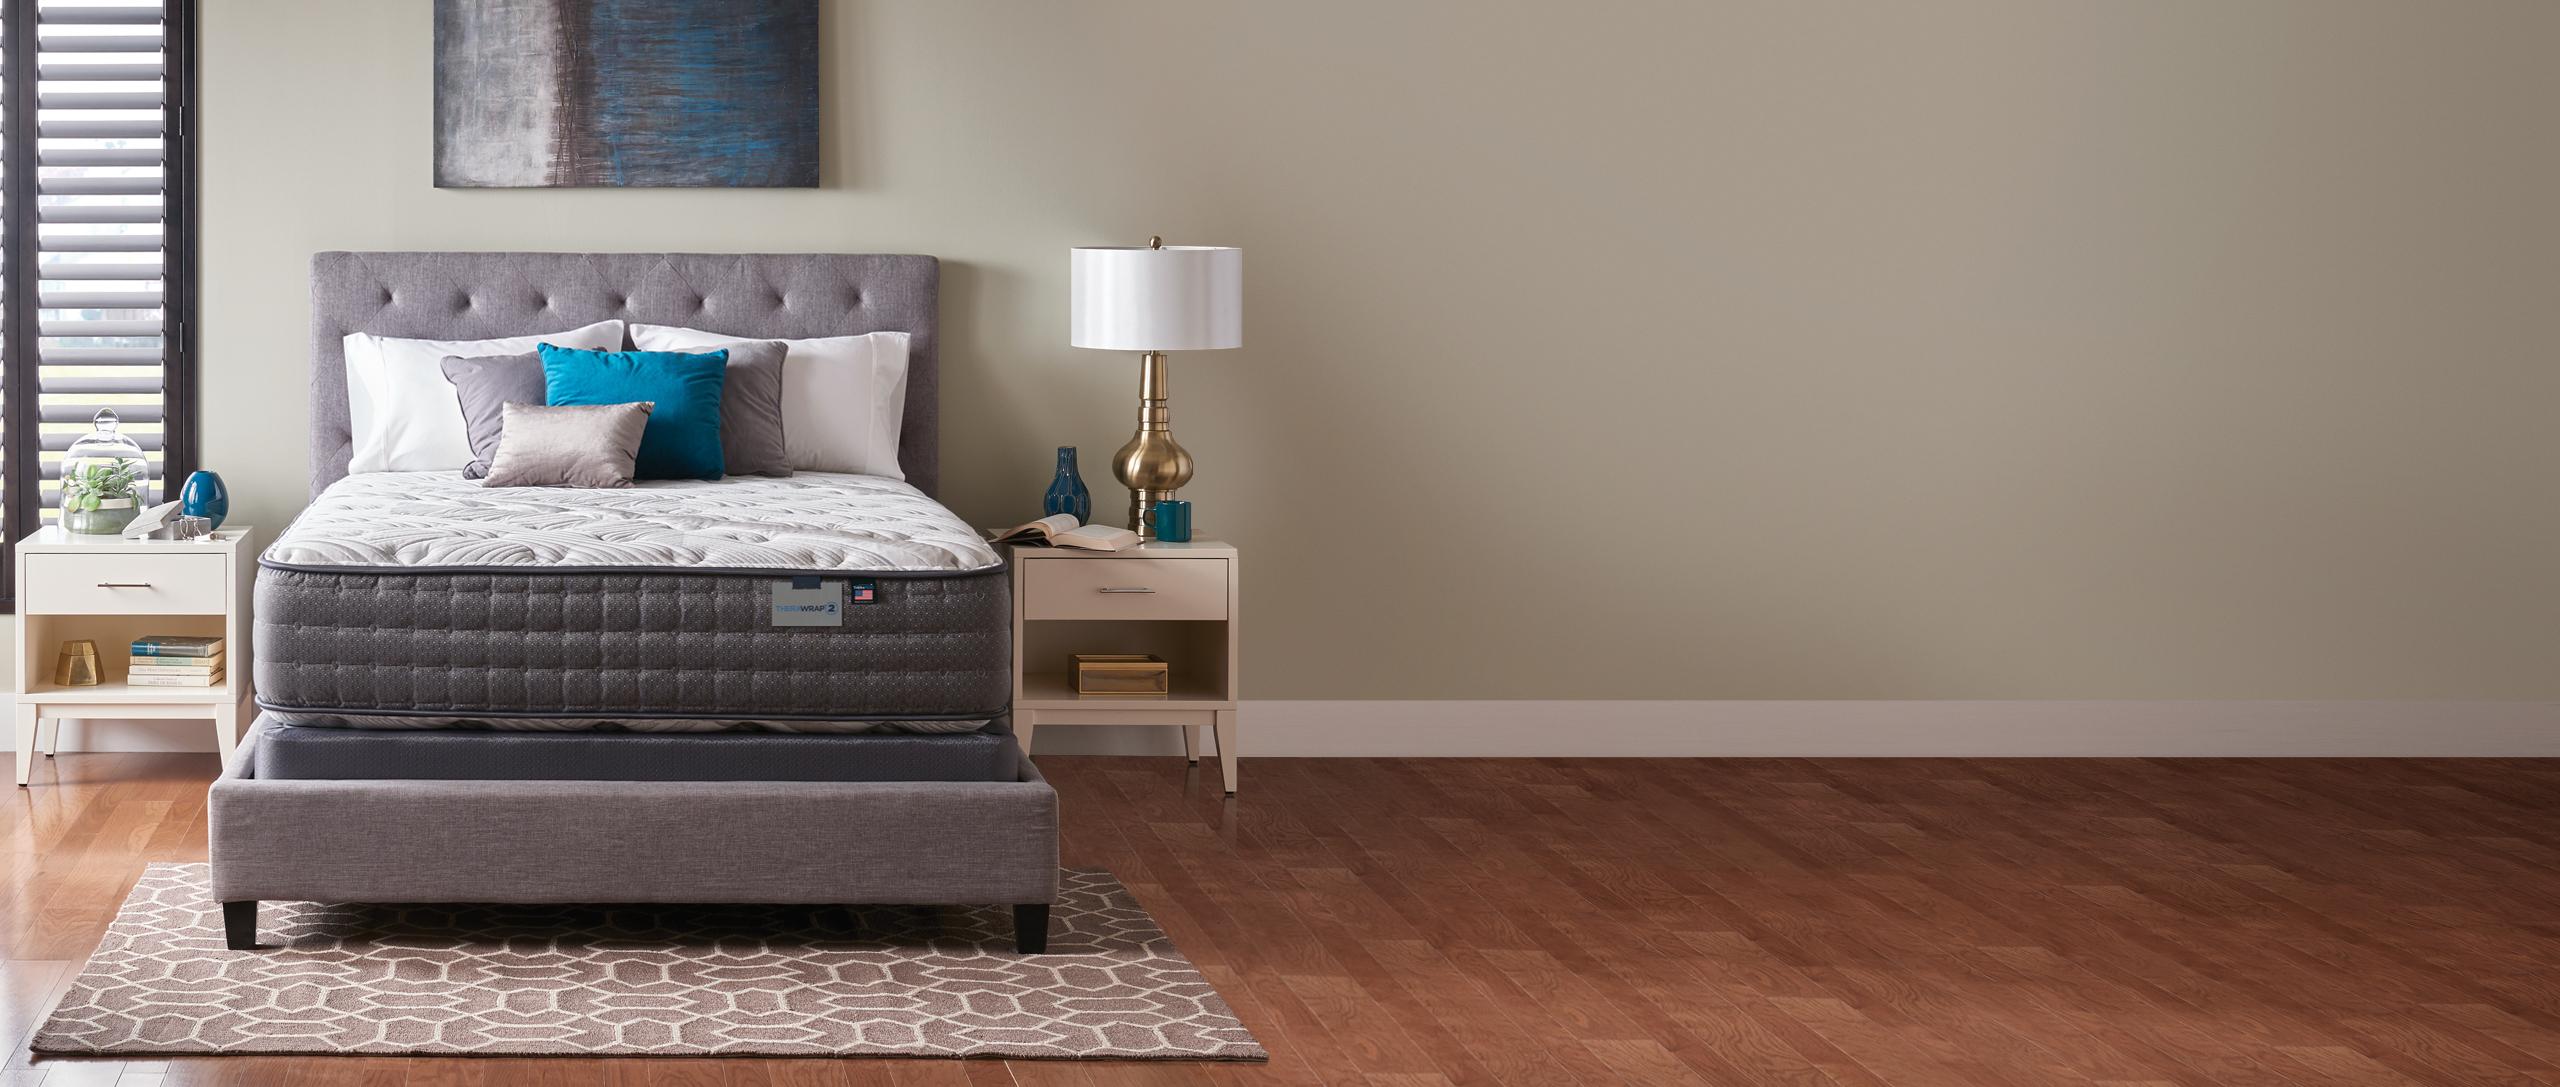 Therawrap 2 Matress in a bedroom setting